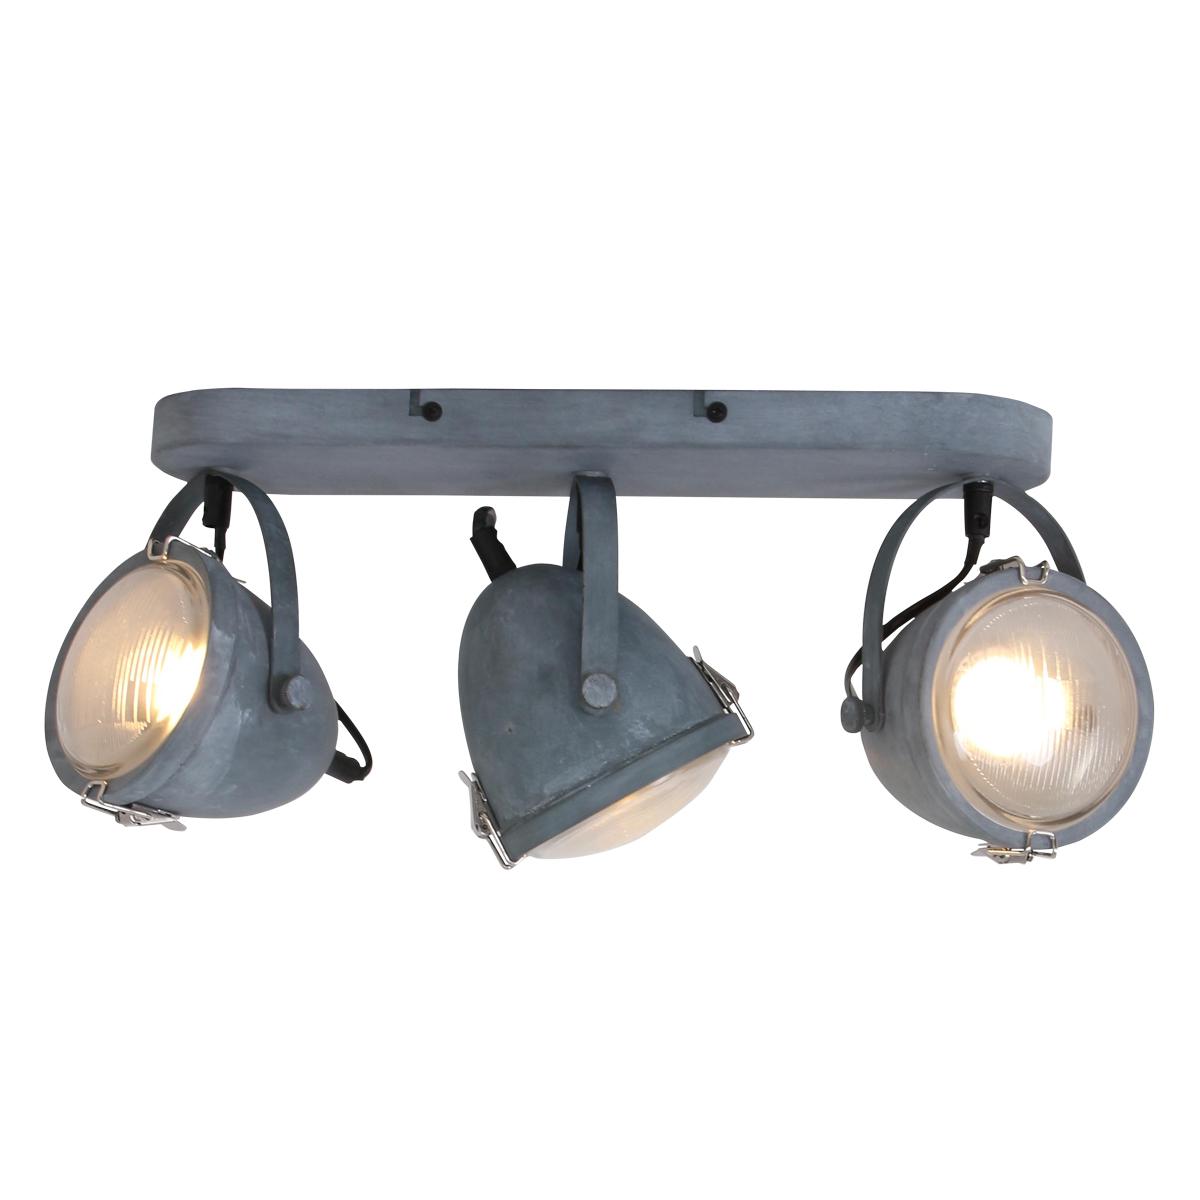 Drielichts grijze plafondlamp mexlite 1314gr industriele for Industriele spots